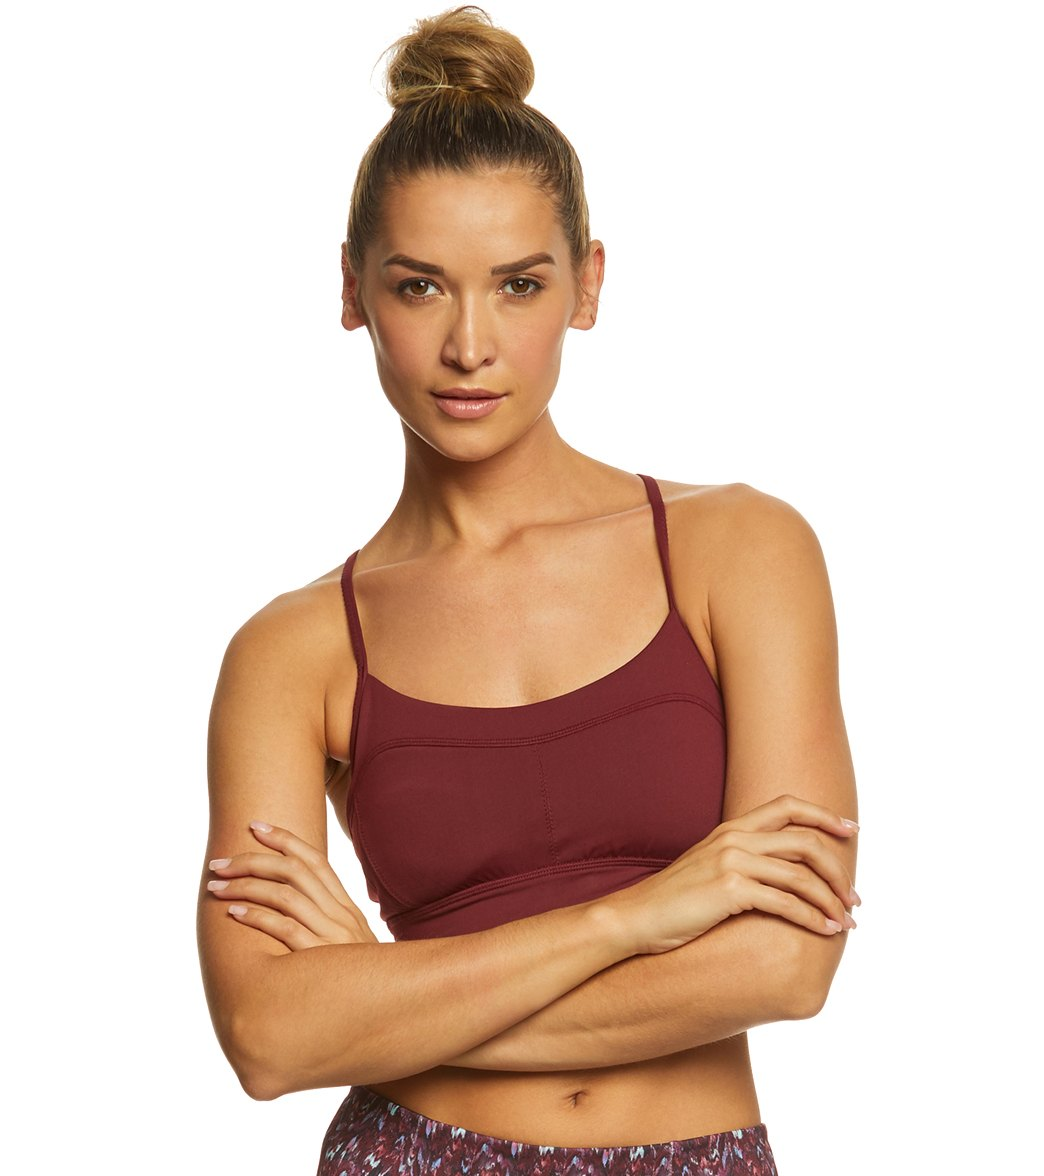 25f57d4ab9 Manduka Pintuck Yoga Sports Bra at YogaOutlet.com - Free Shipping